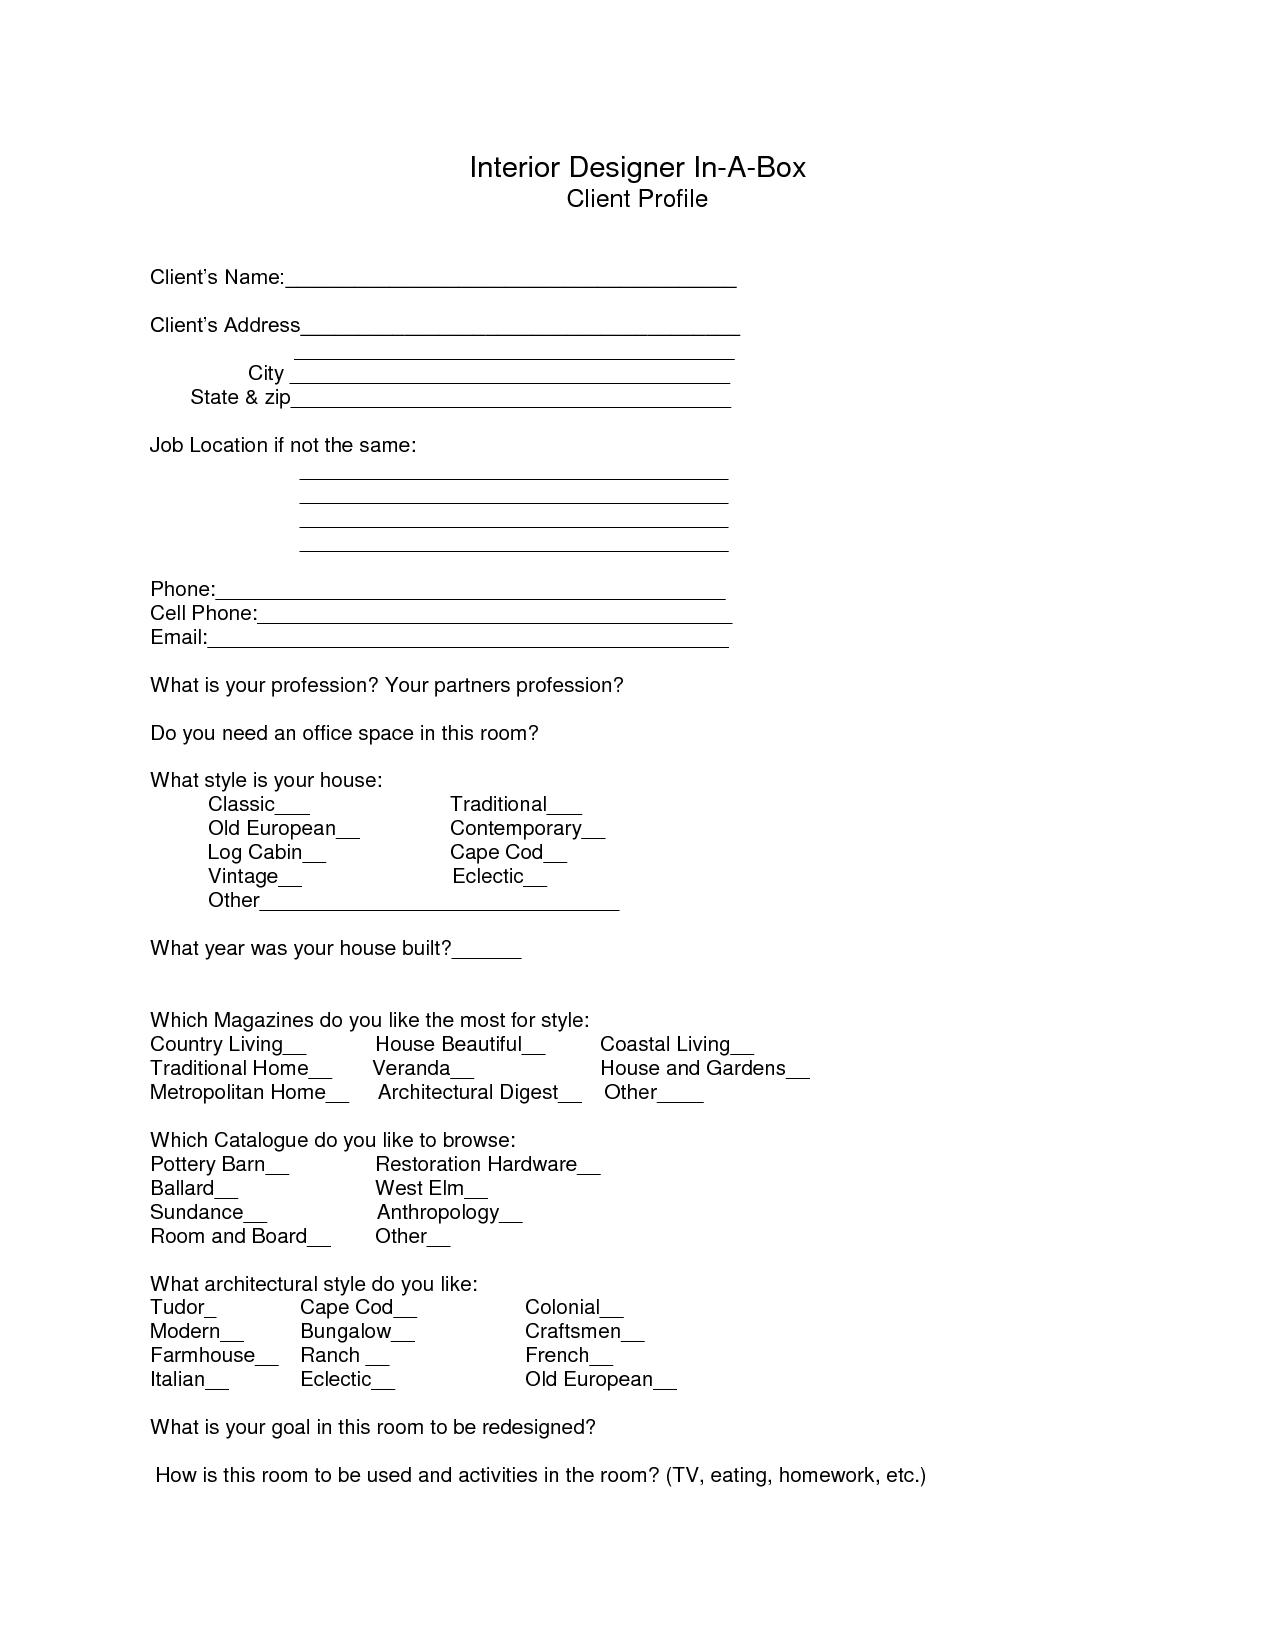 Client Profile Template For Interior Design